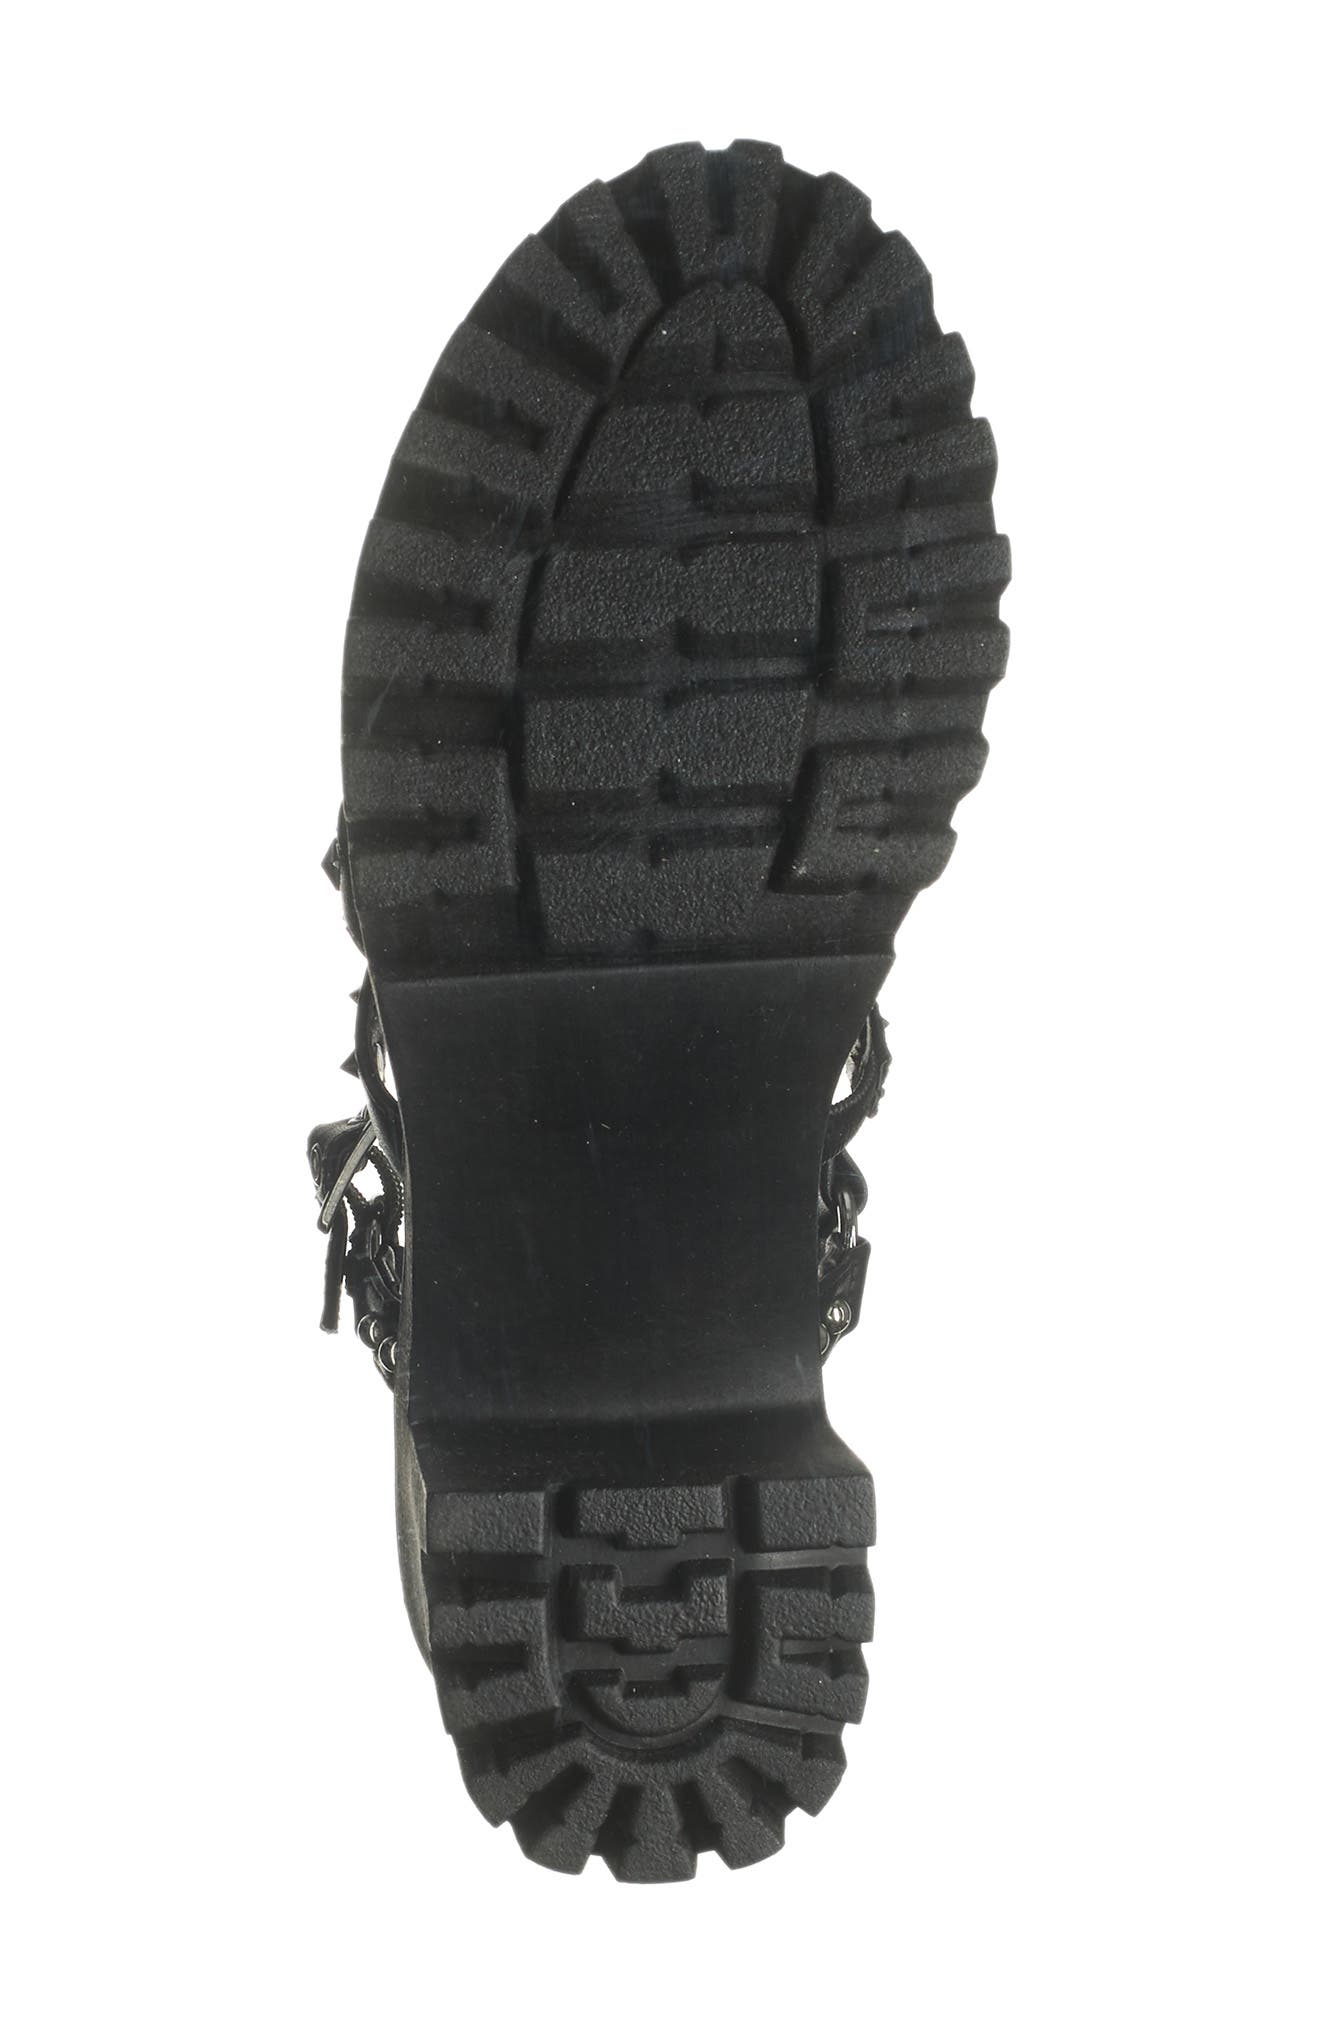 Image of Madden Girl Sassy Studded Platform Heeled Sandal